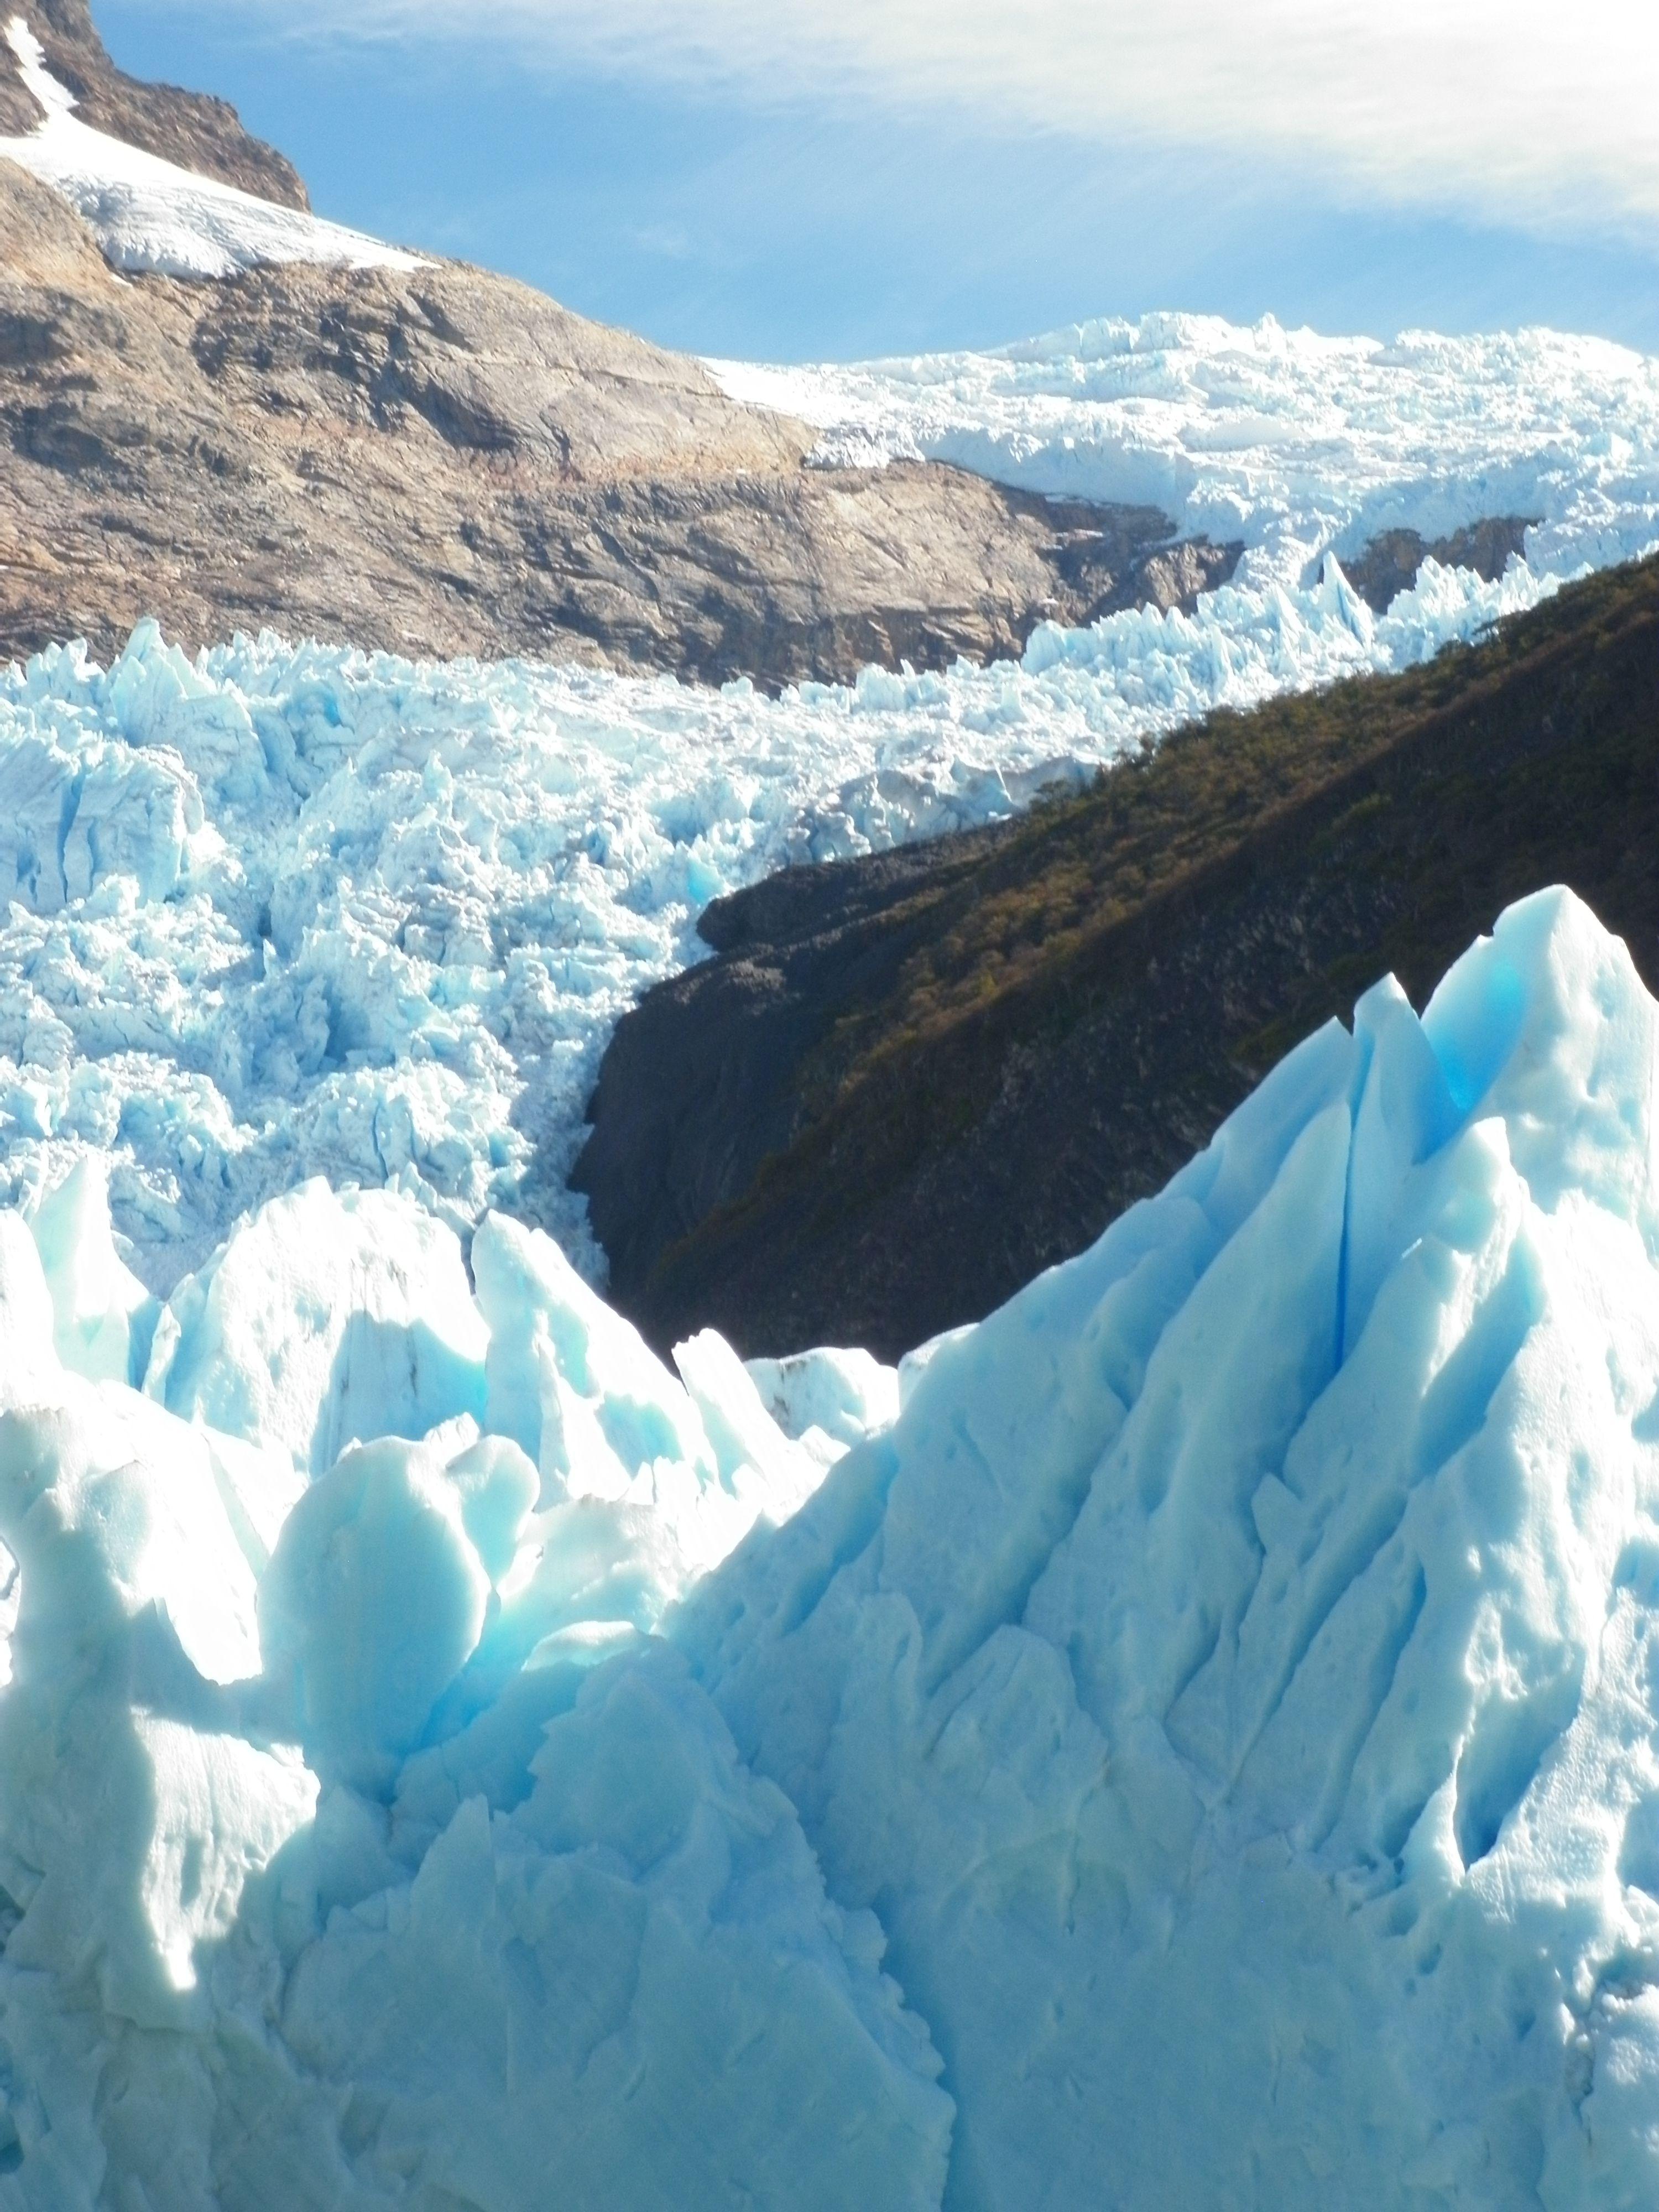 .:Glaciar Spegazzini, El Calafate Argentina:.